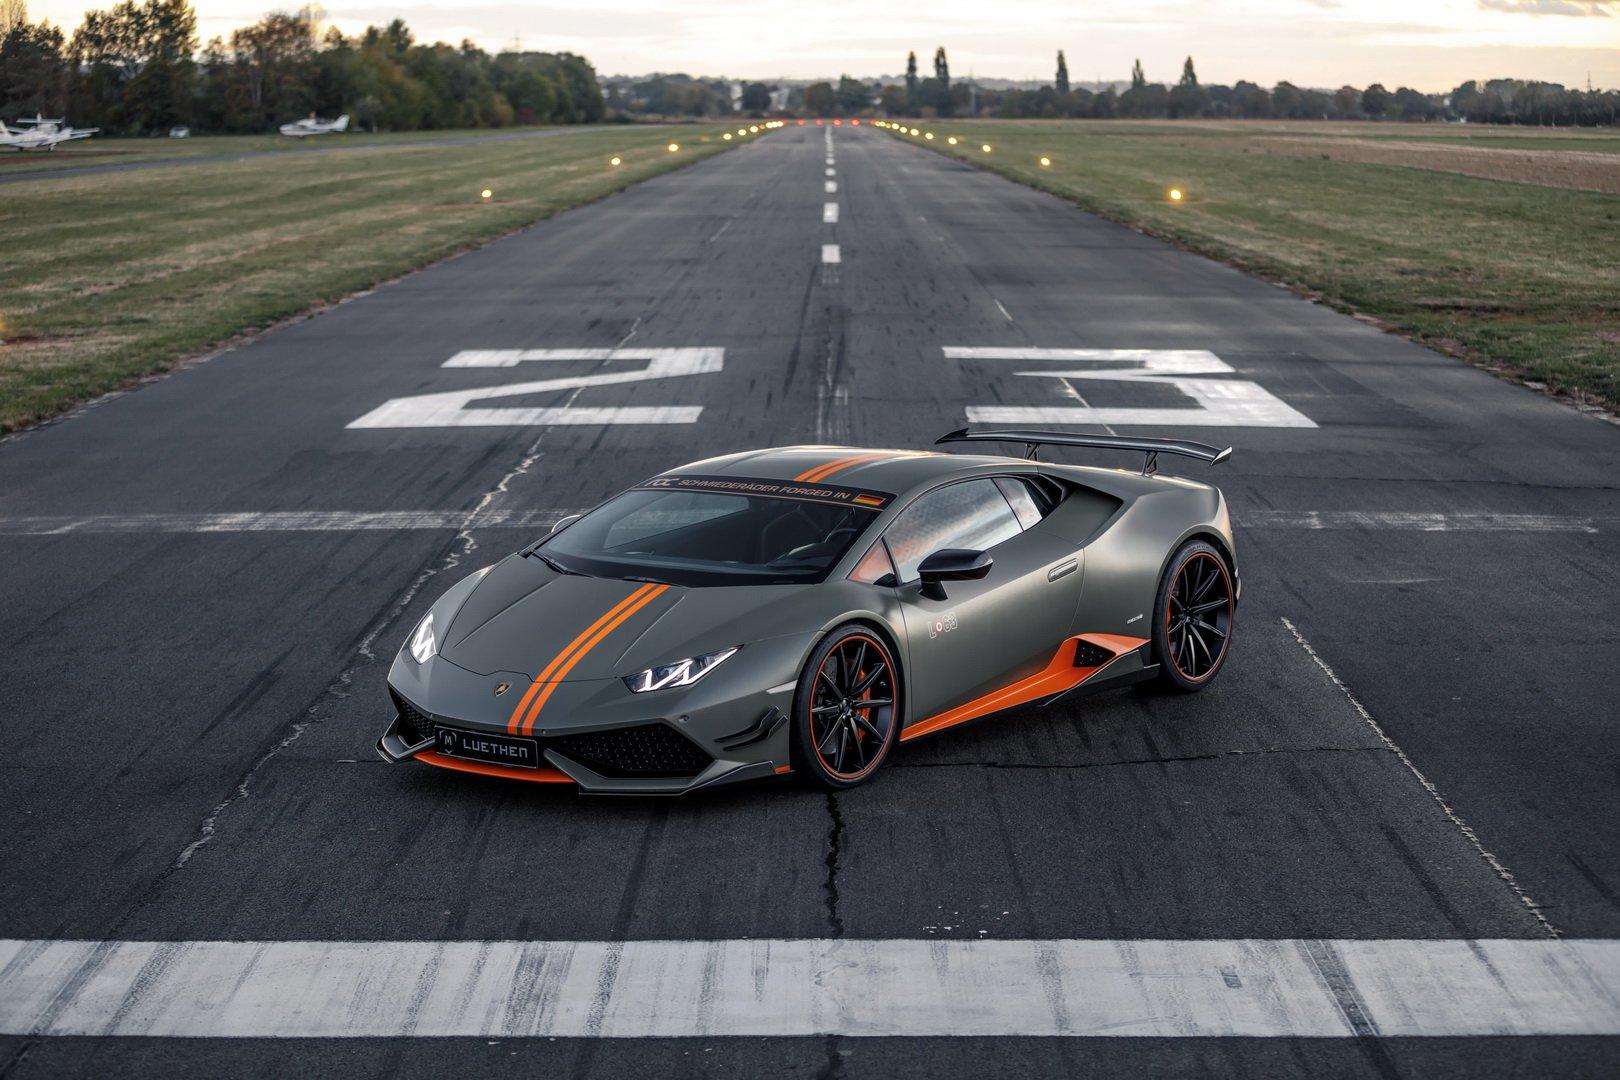 Lamborghini Huracan Avio by Luethen Motorsport (24)